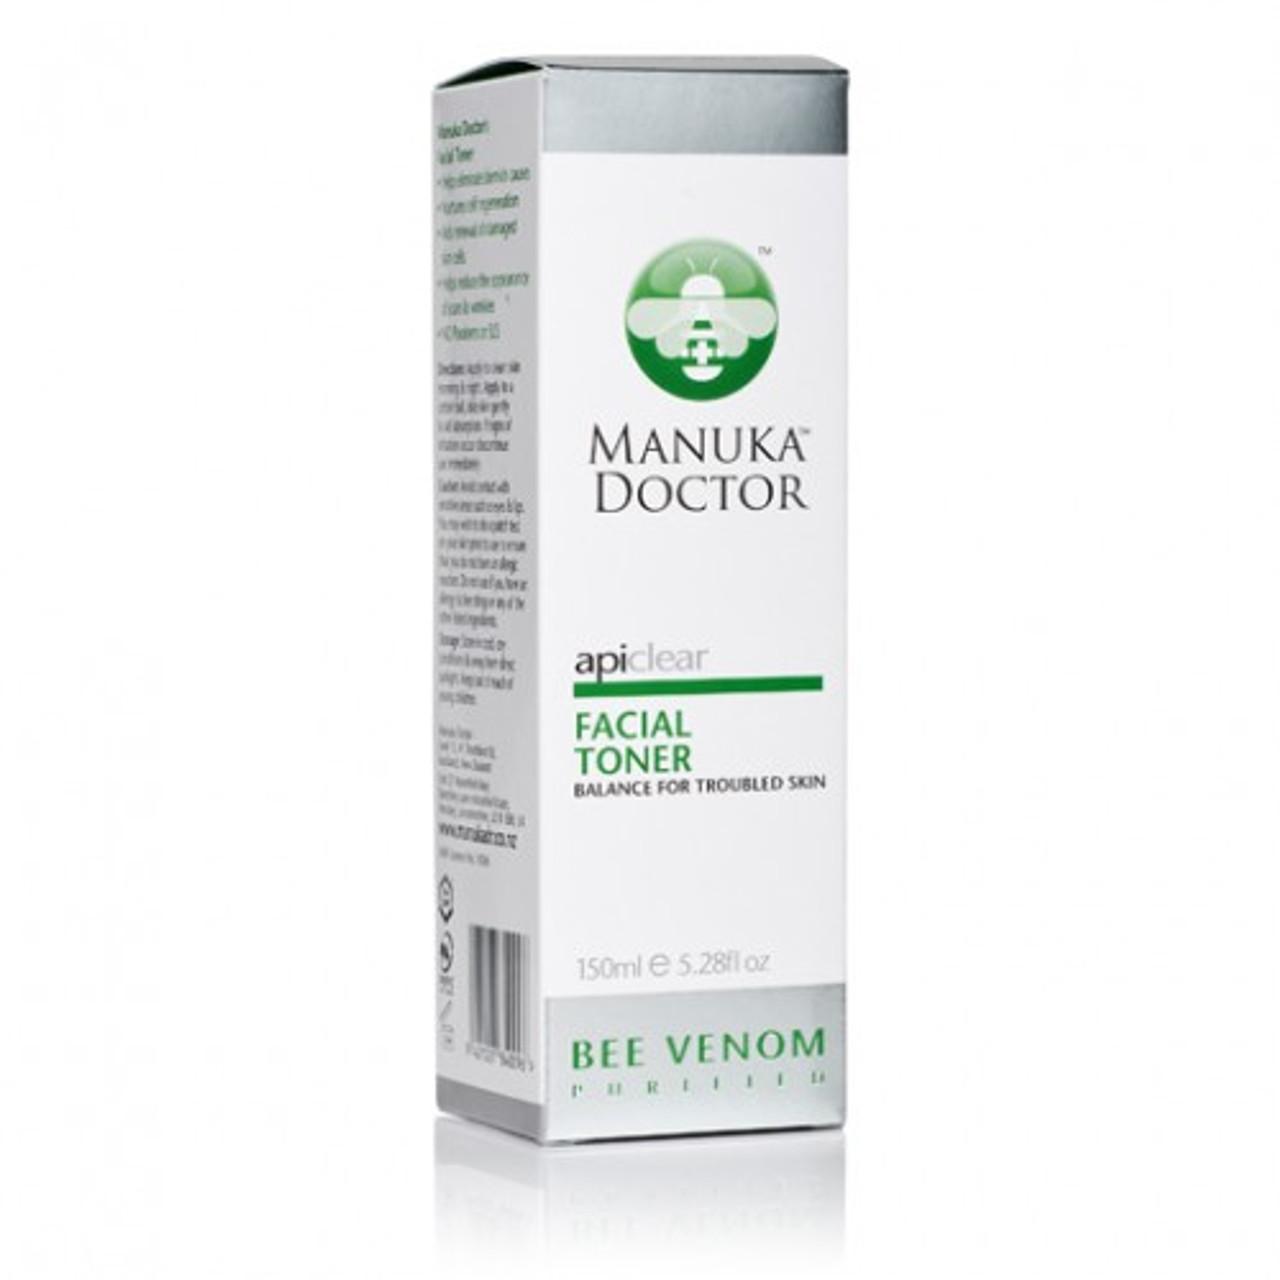 ApiClear Skin Toner 150ml Manuka Doctor